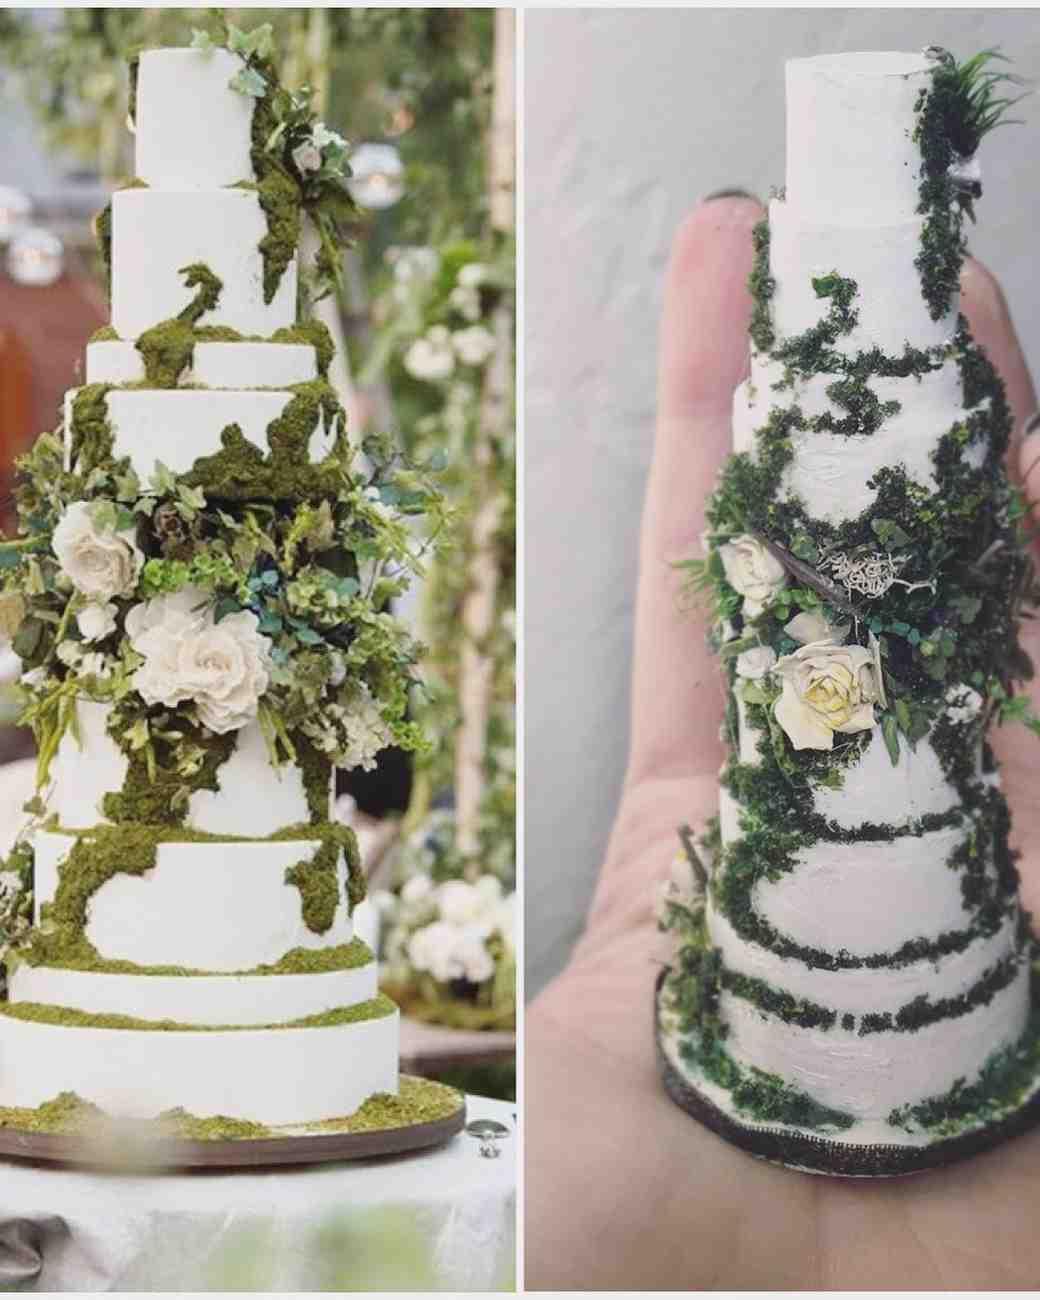 Ivy-inspired wedding cake